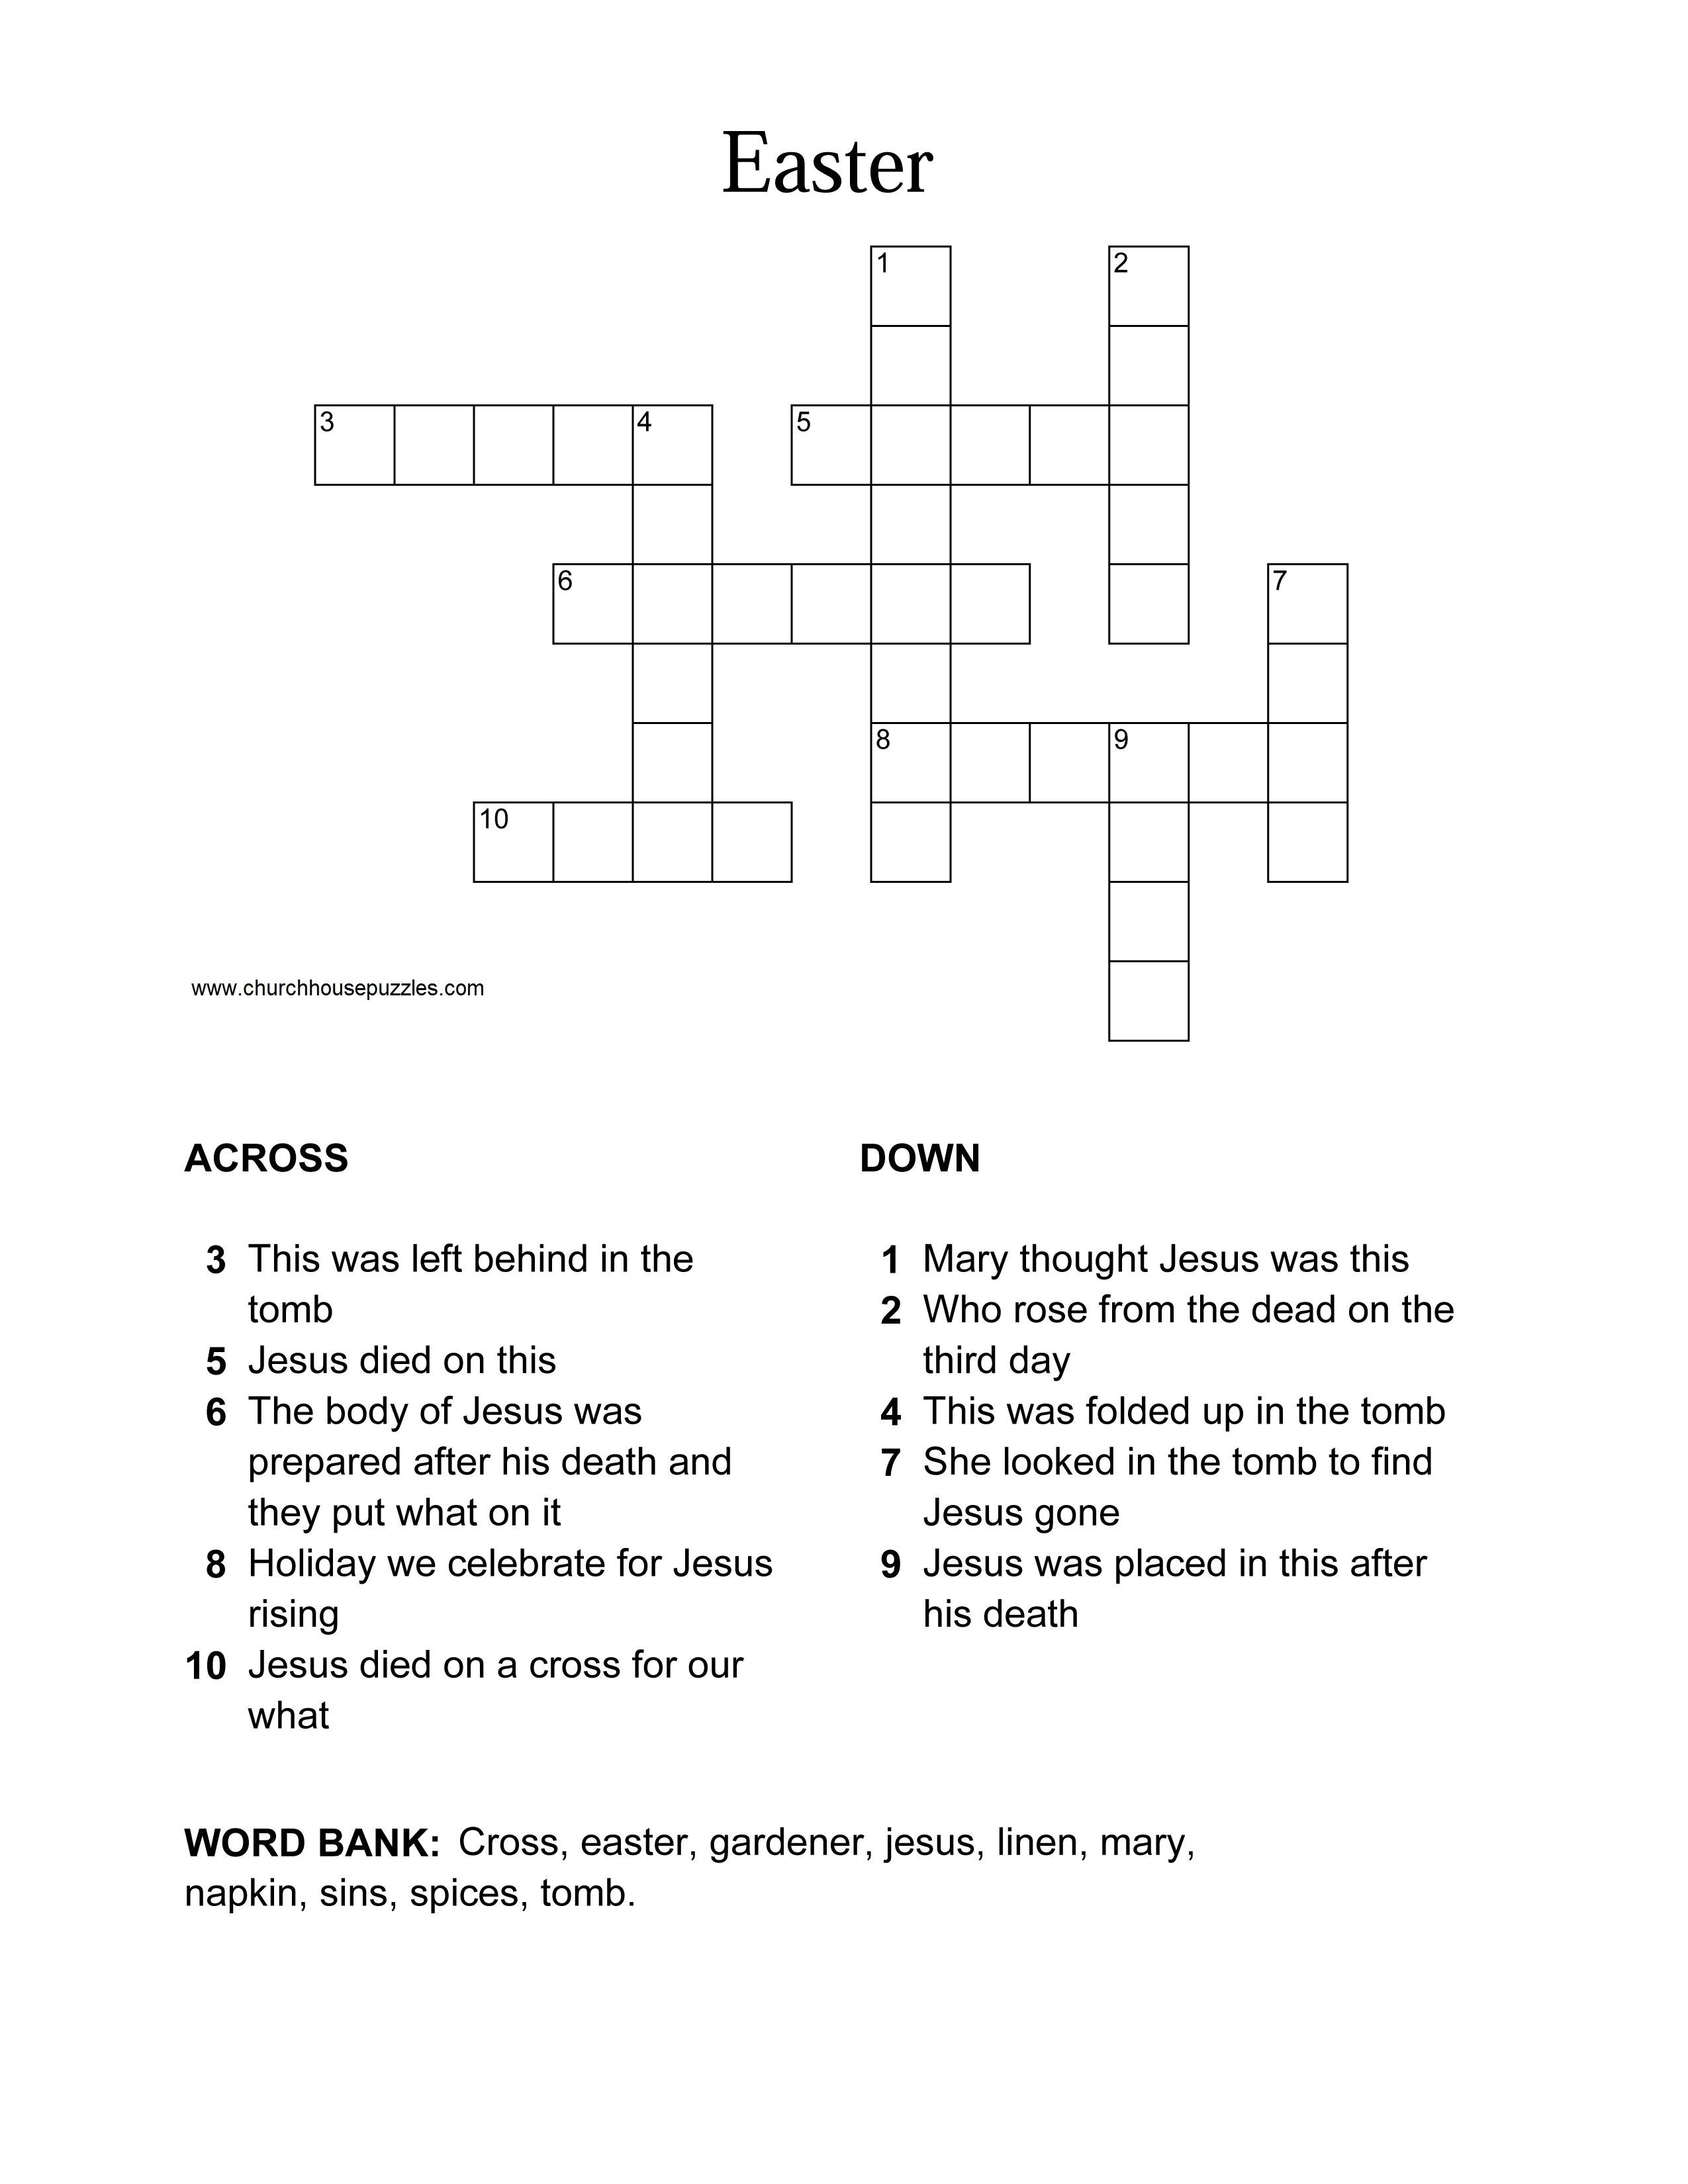 Easter Crossword Puzzle - Printable Crossword Easter